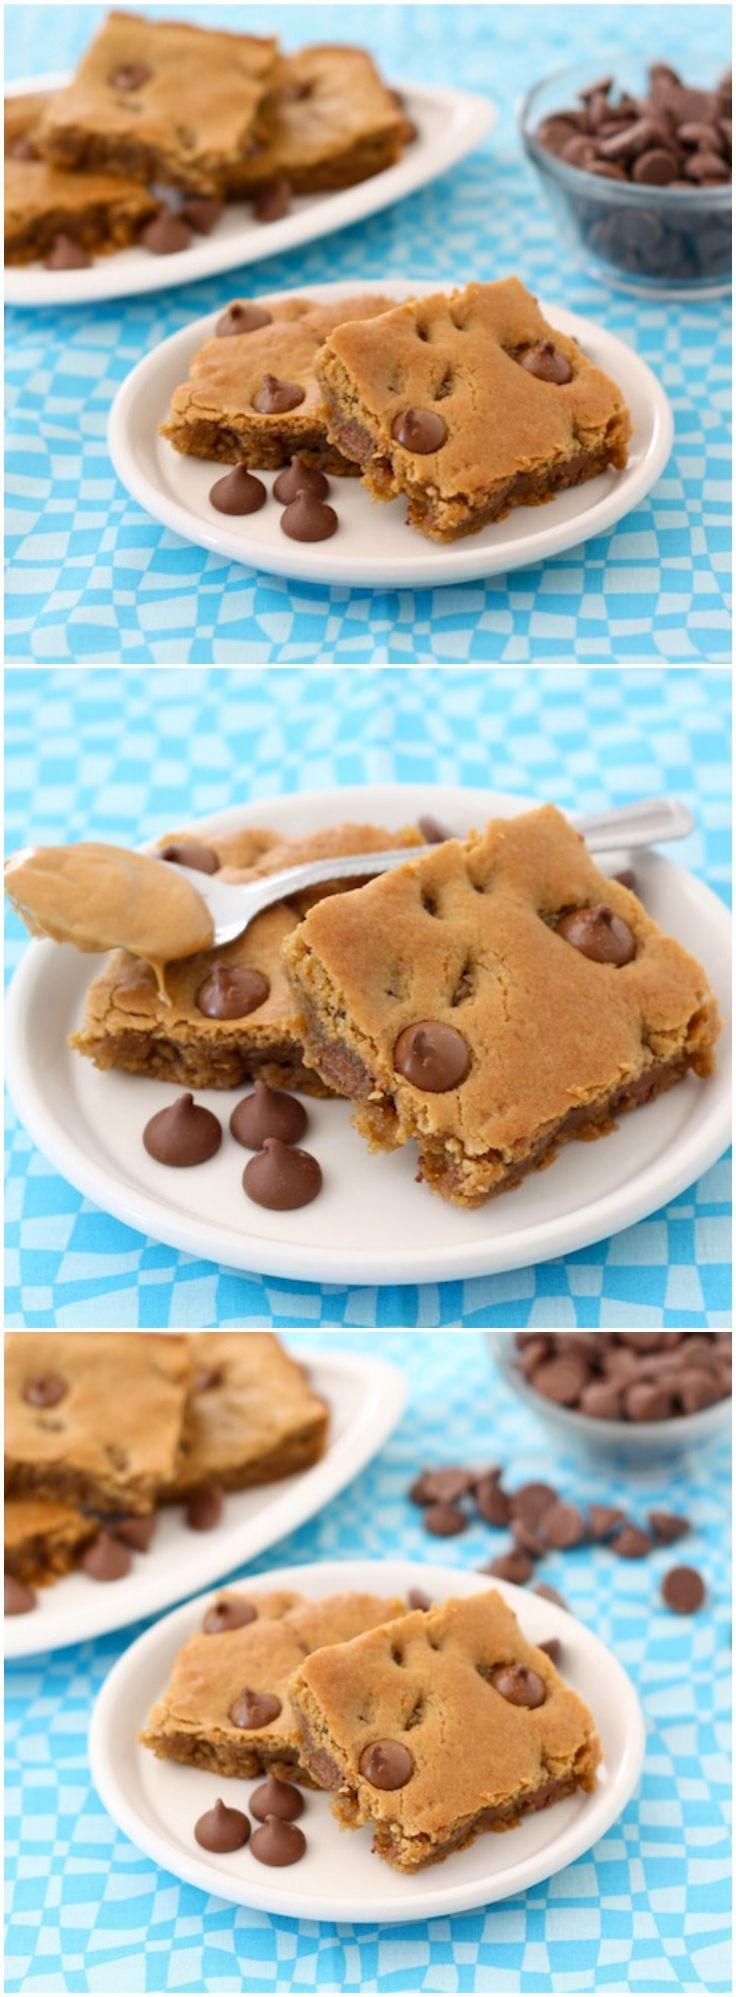 #Recipe: Peanut Butter Chocolate Chip Blondies #dessert